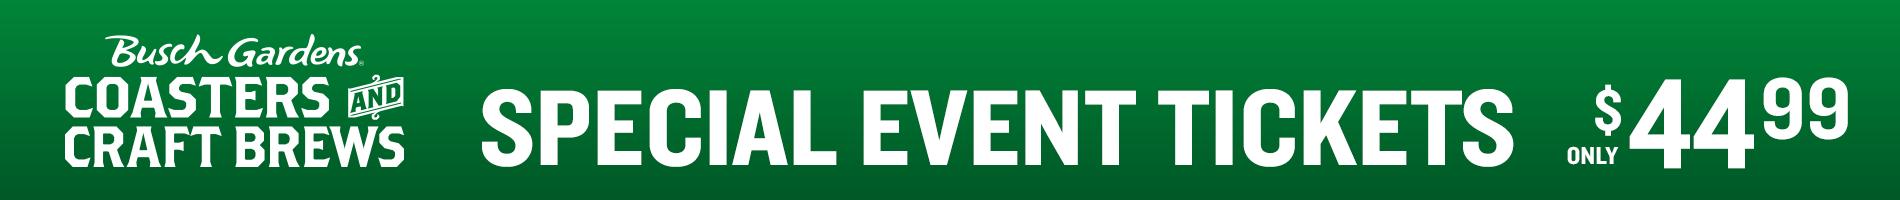 Busch Gardens Coasters and Craft Brews Special Event Tickets